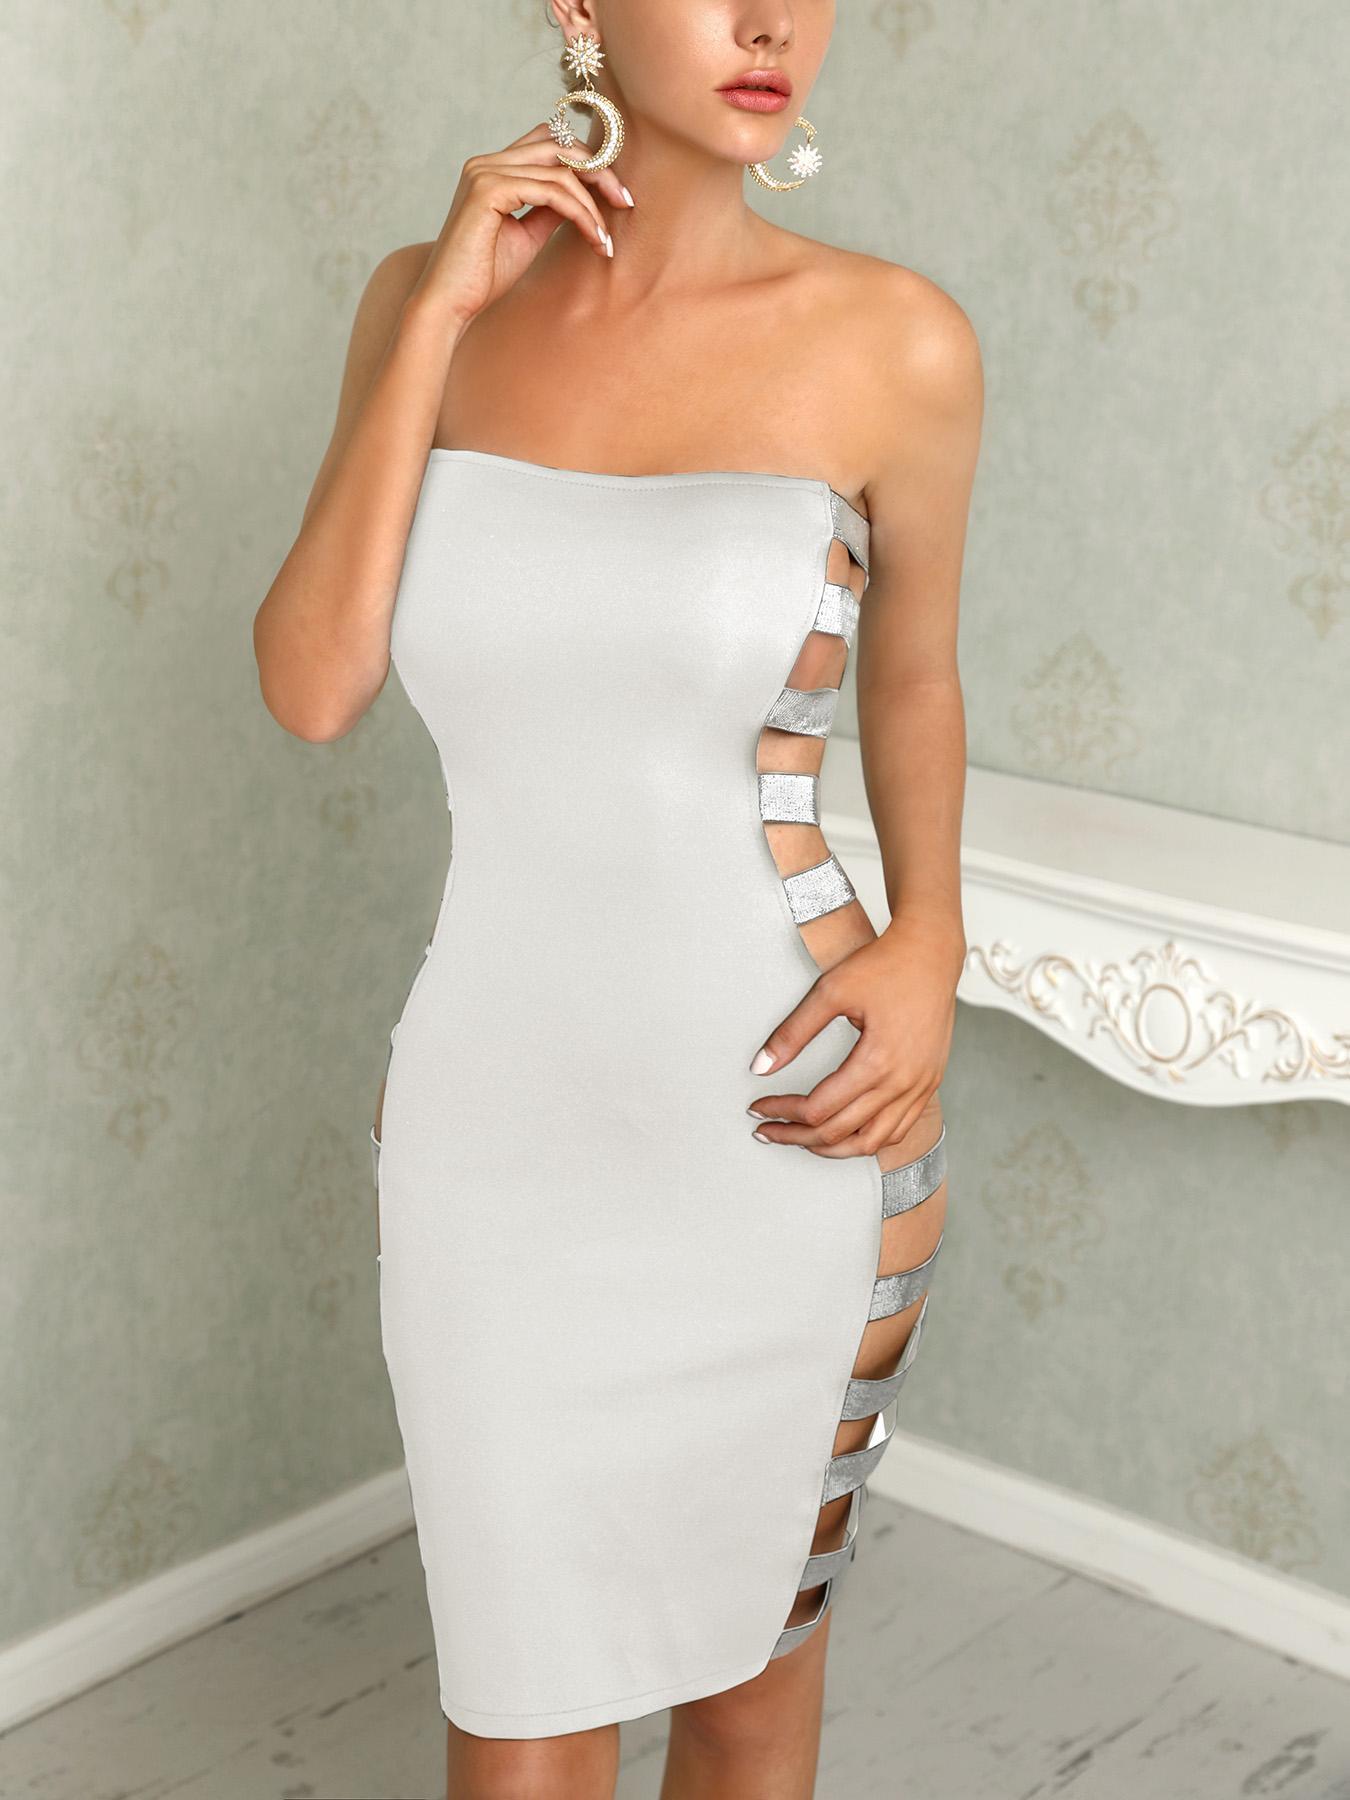 chicme / Mini vestido sin mangas con abertura en lentejuelas